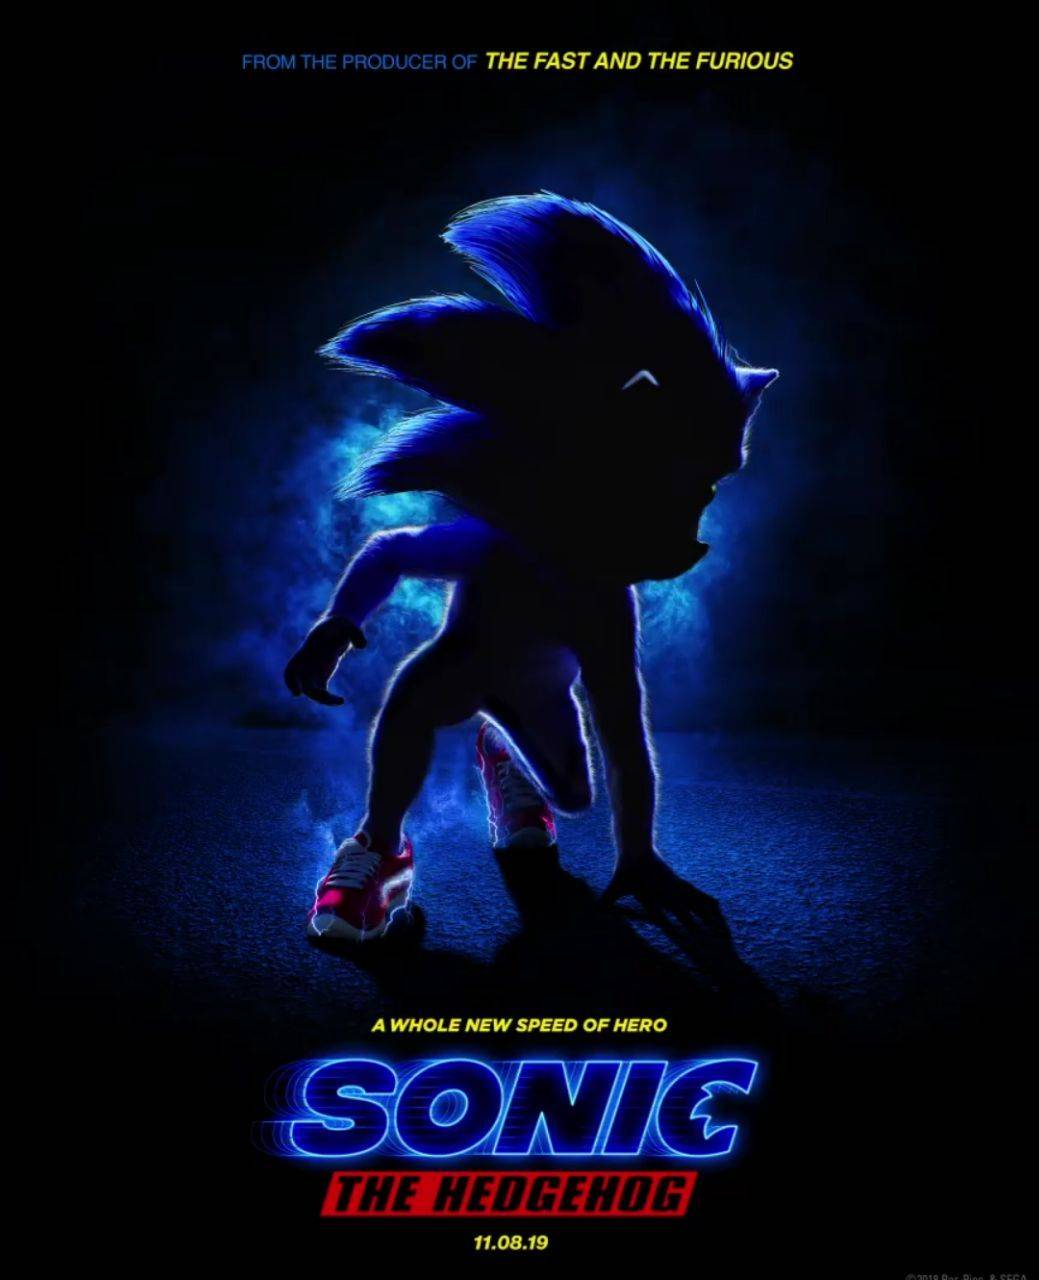 Resultado de imagen para sonic the hedgehog poster